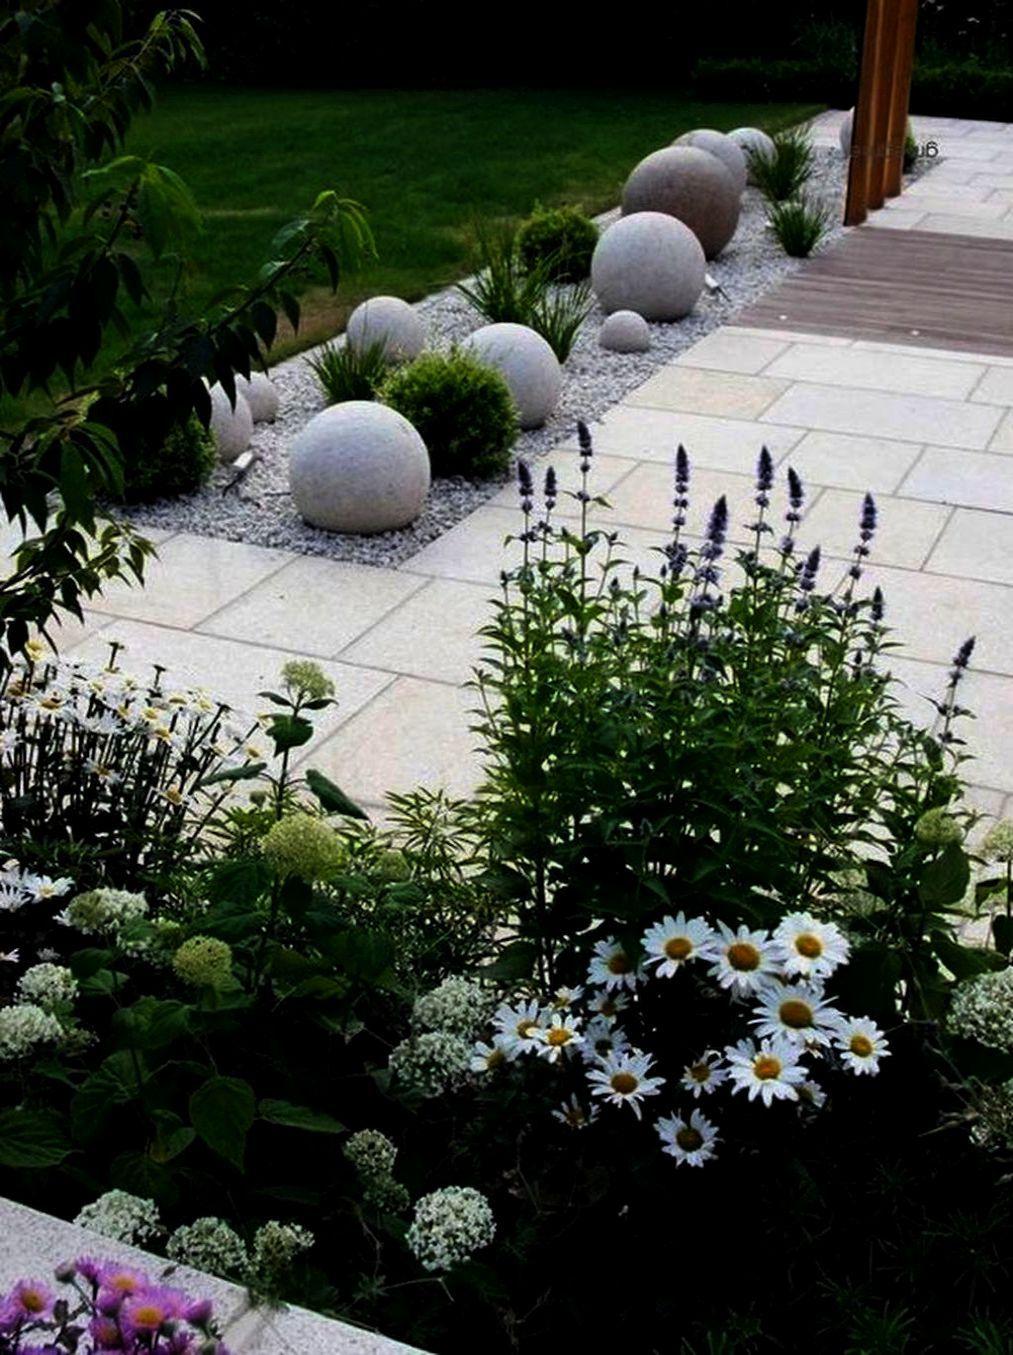 Landscape Gardening Course regarding Landscape Gardening ...